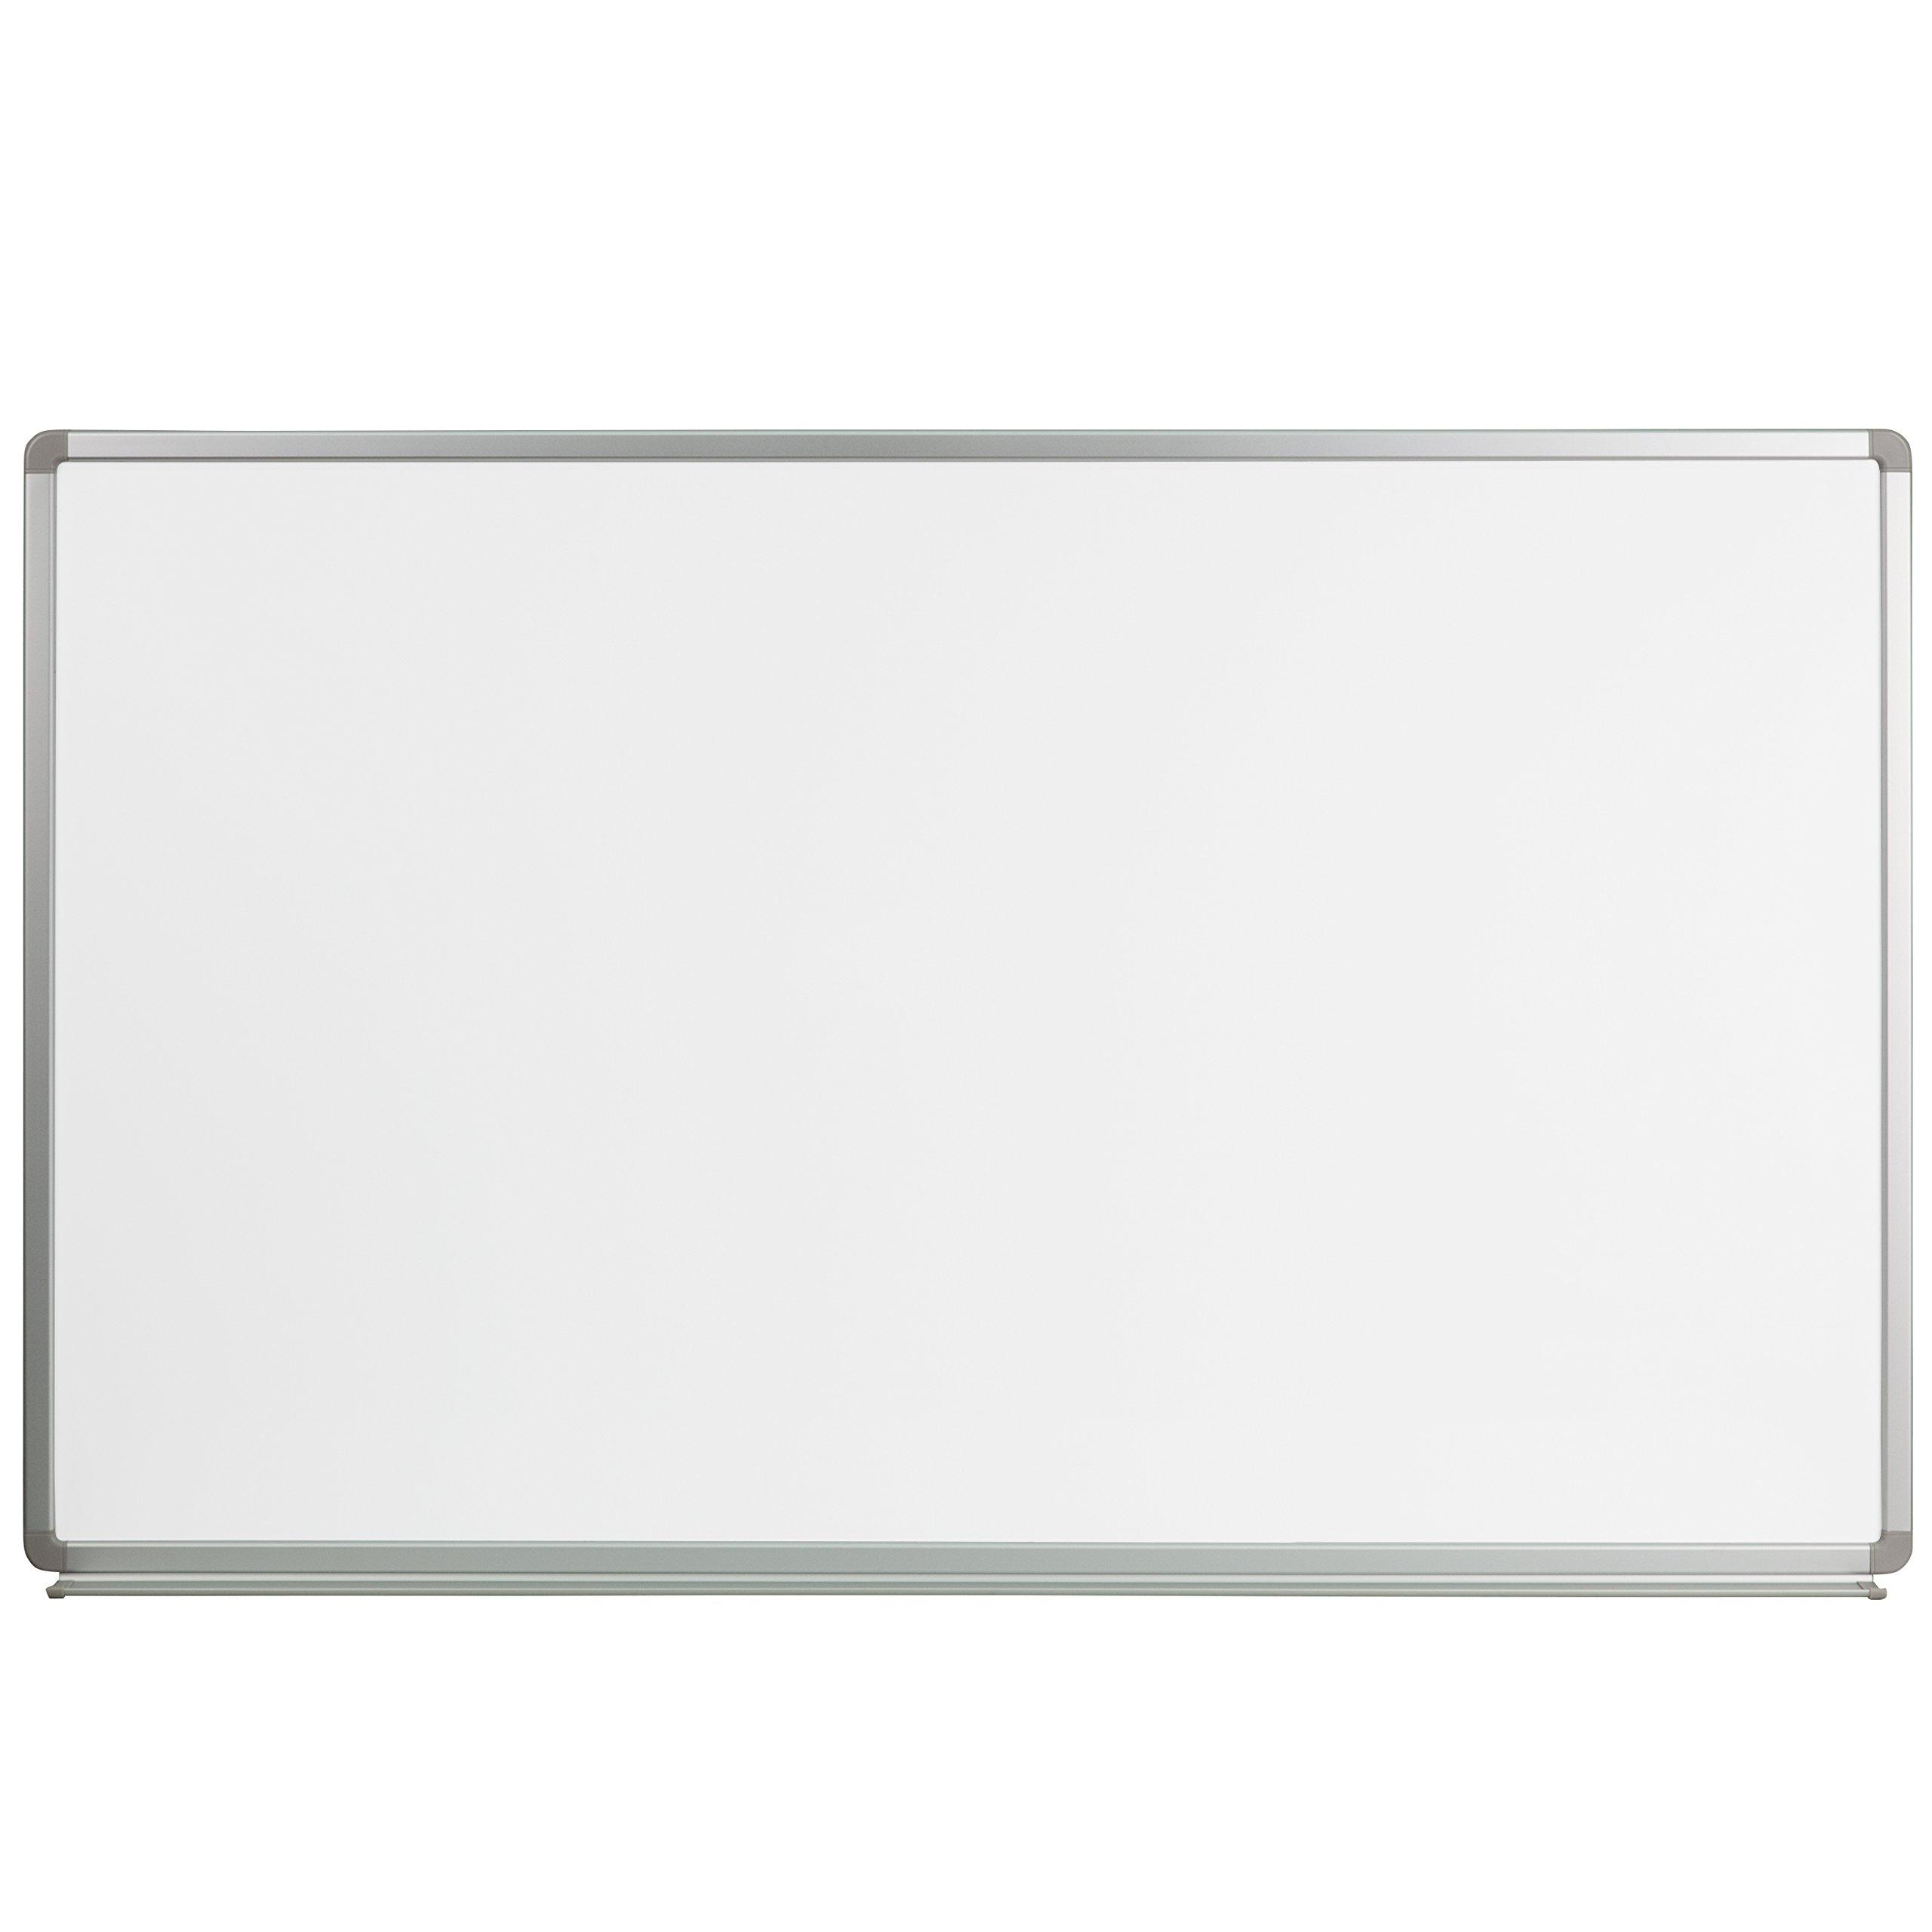 Flash Furniture 5' W x 3' H Magnetic Marker Board by Flash Furniture